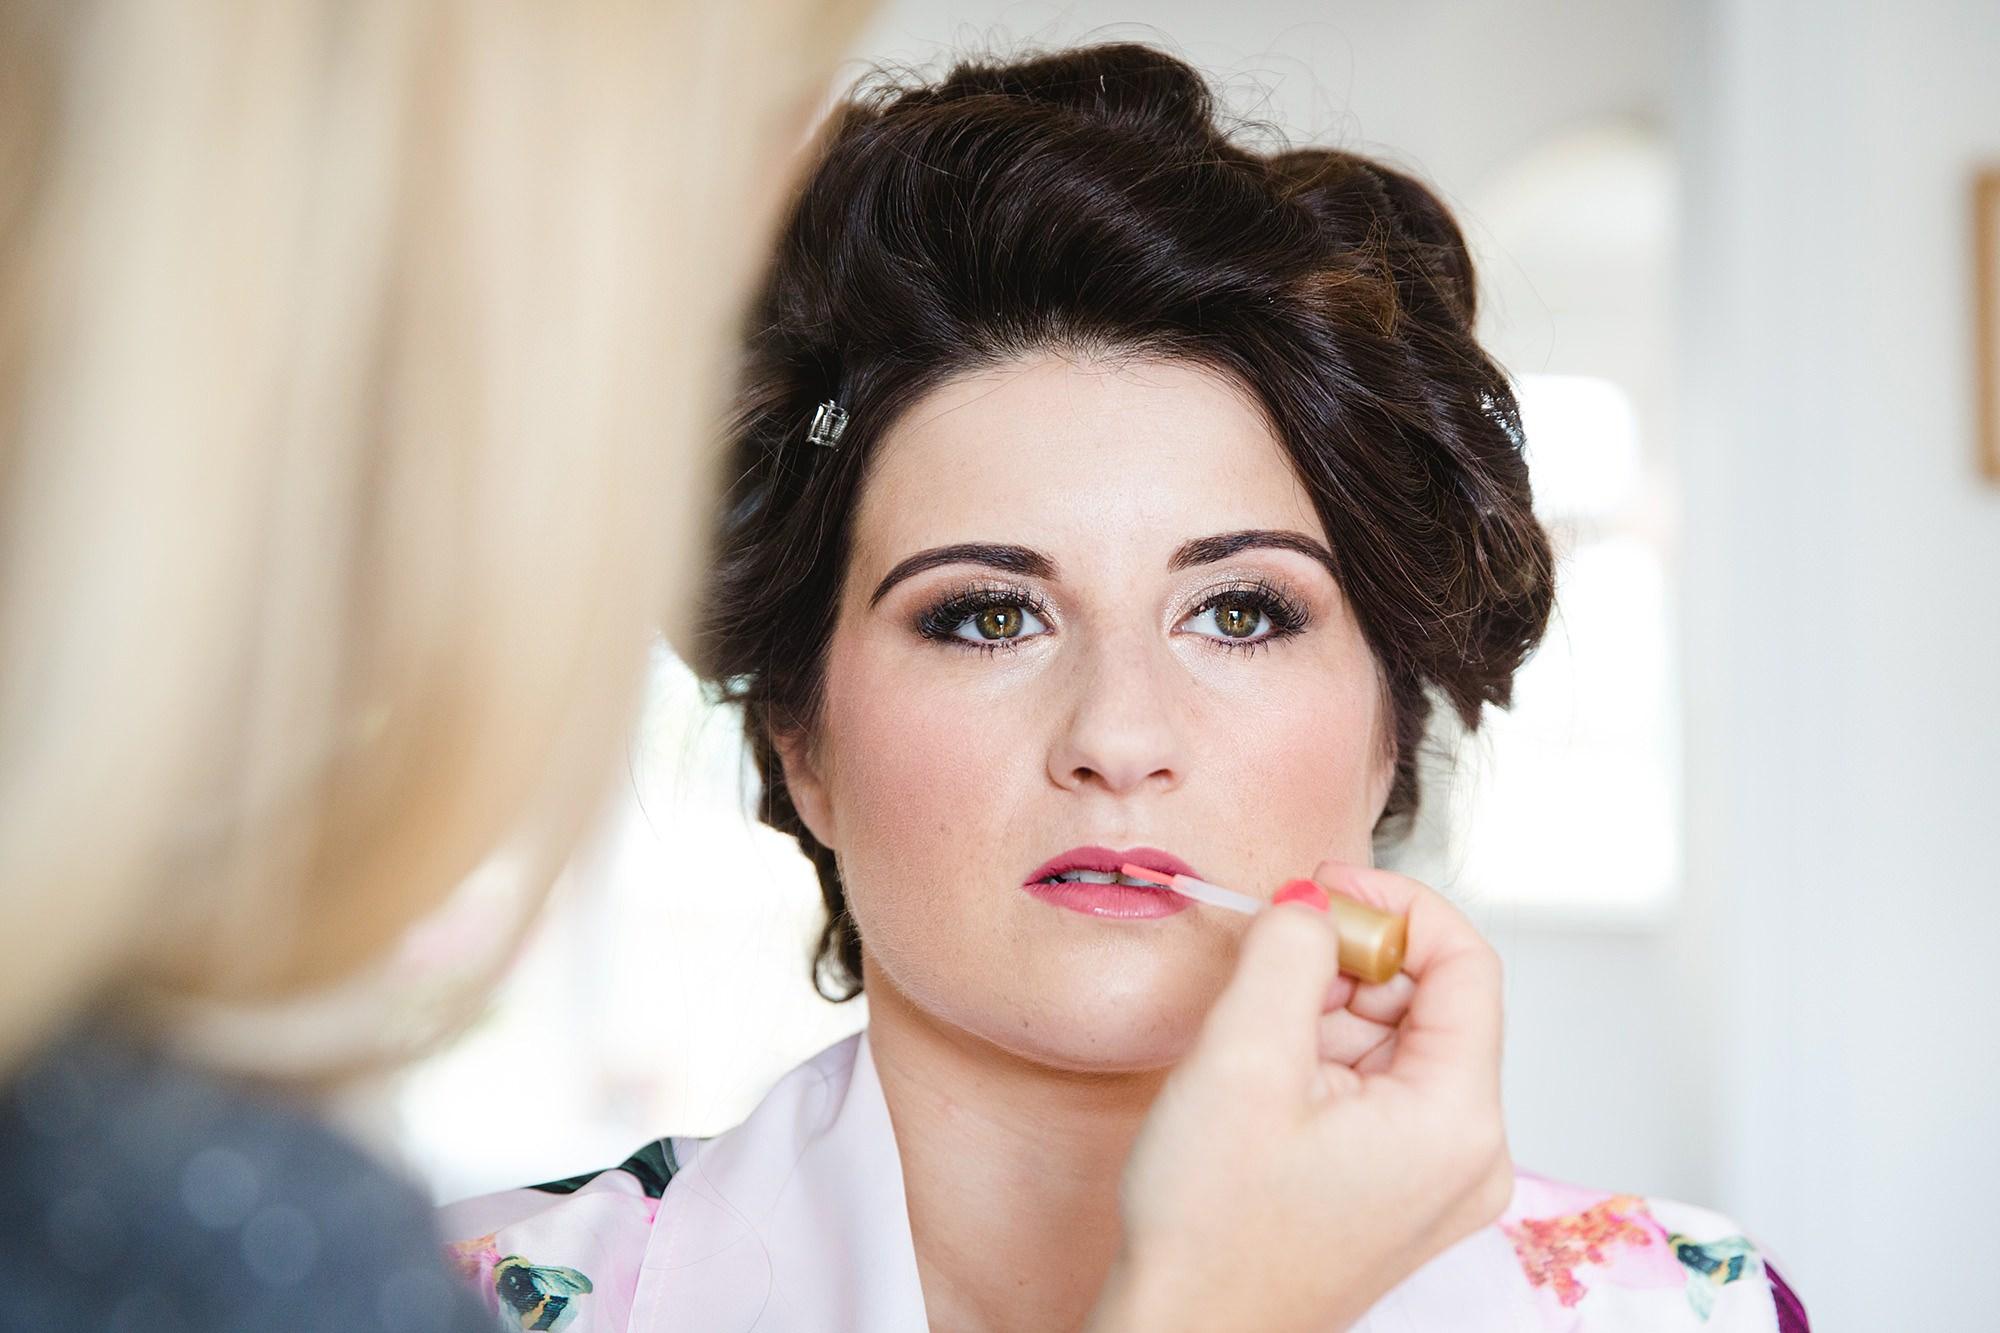 Lillibrooke Manor wedding bride has lipstick applied